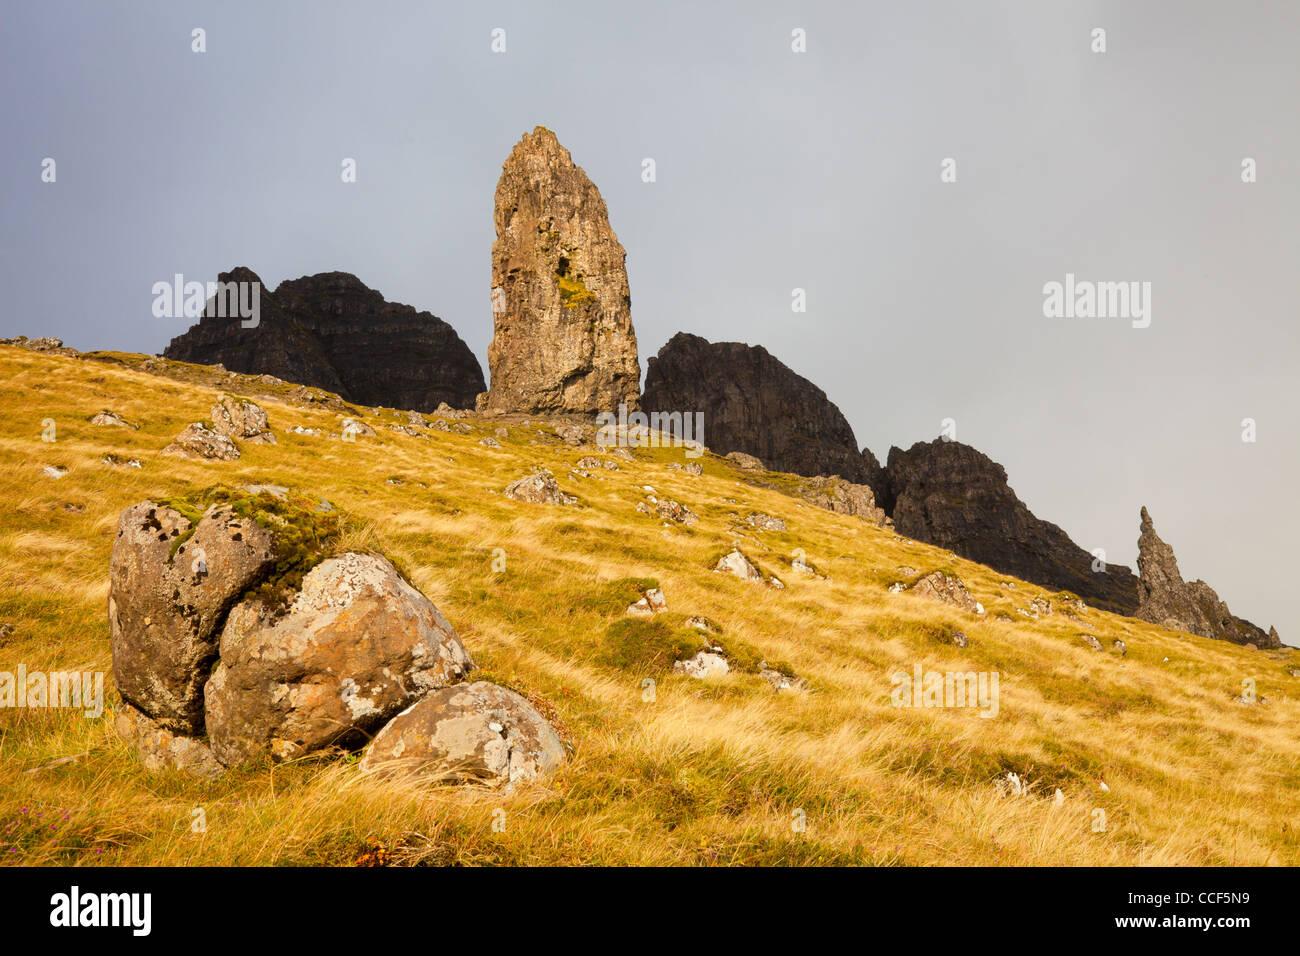 The Old Man of Storr on the Trotternish Ridge on the Isle of Skye, Scotland - Stock Image